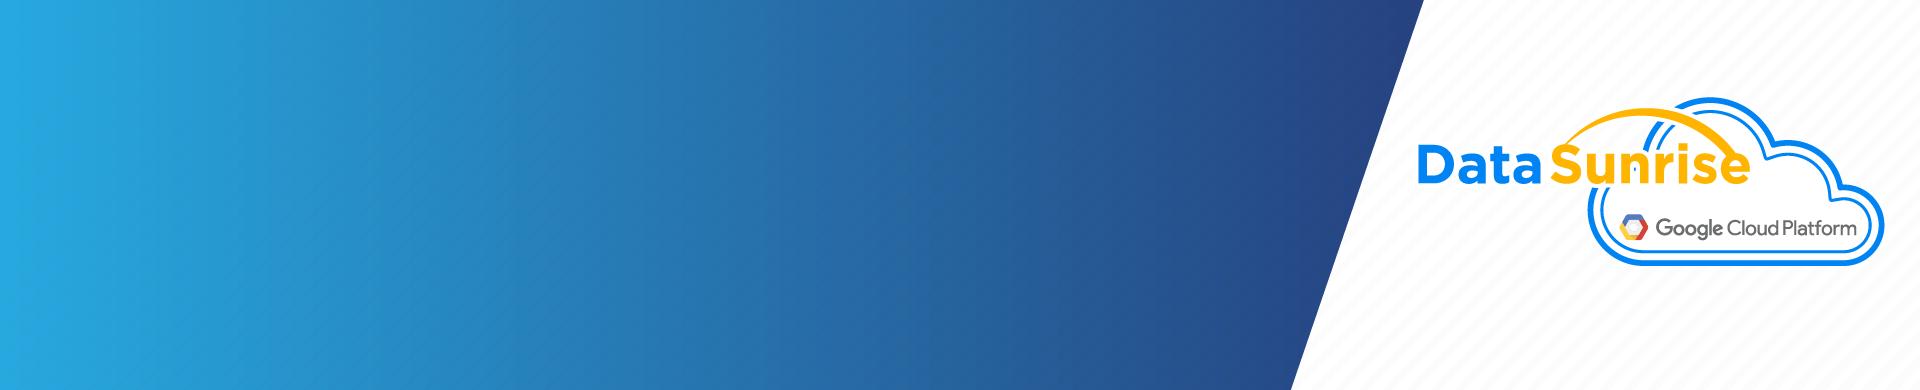 DataSunrise Deployment on Google Cloud Platform